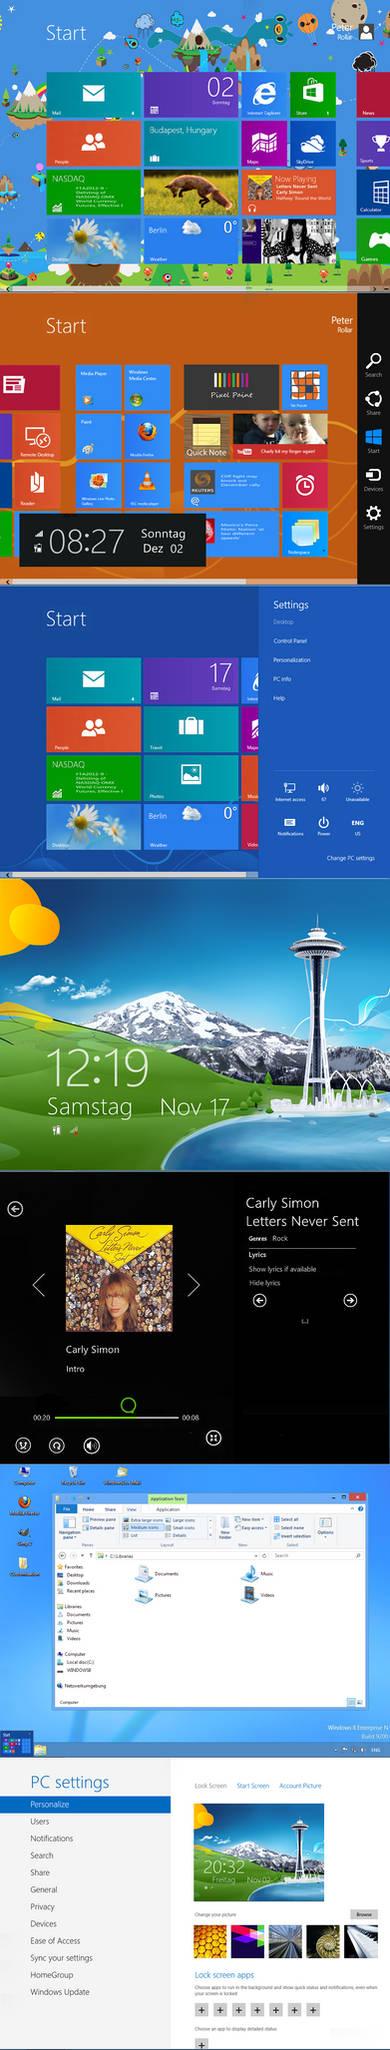 Windows 8 RTM Startscreen SDK